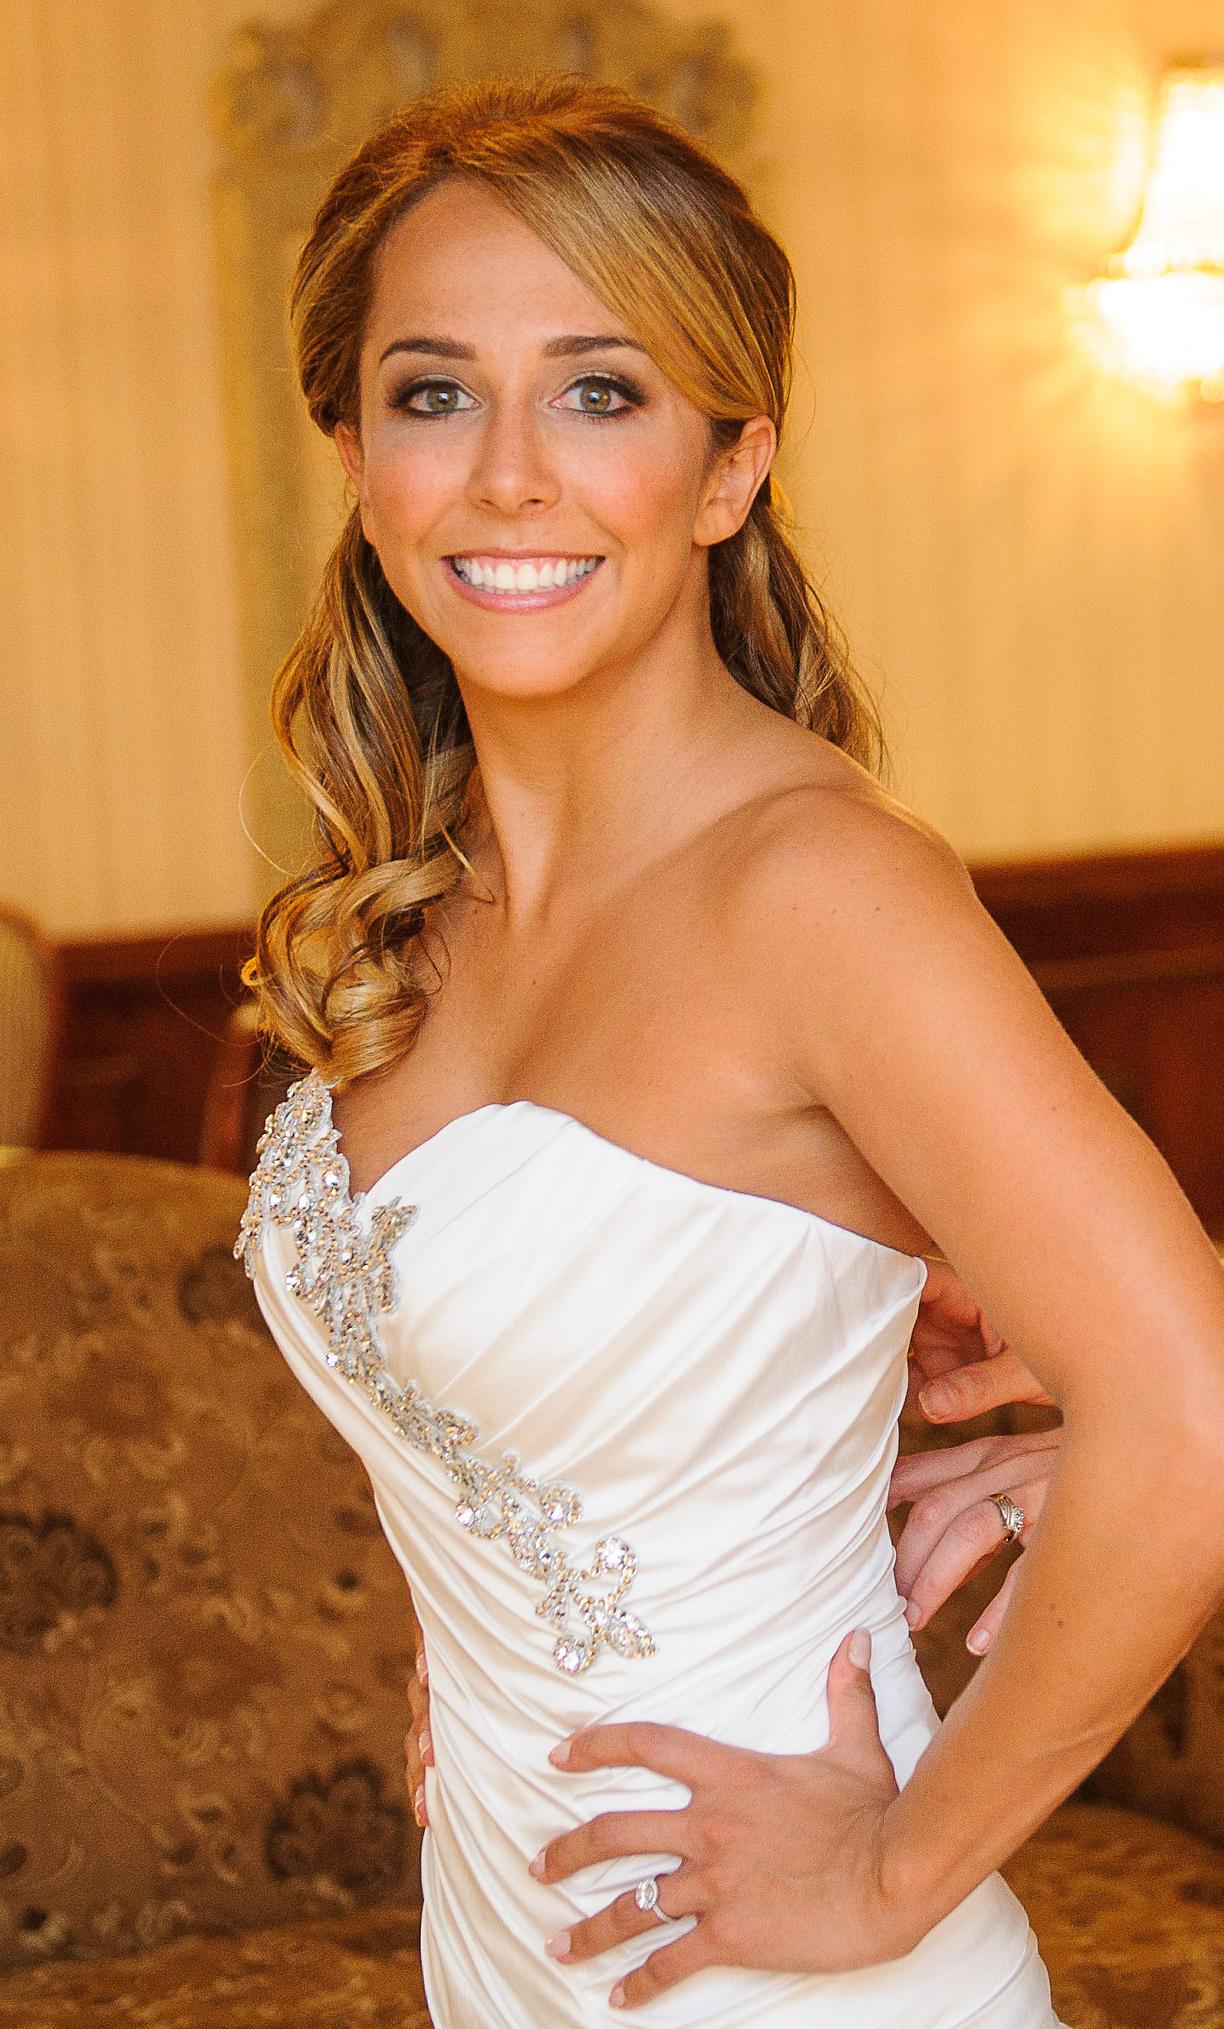 Ceci_New_York_Custom_Invitation_ New_Jersey_Wedding_Luxury_Personalized_Ceci_Style_Bride_Foil_Stamping180.jpg